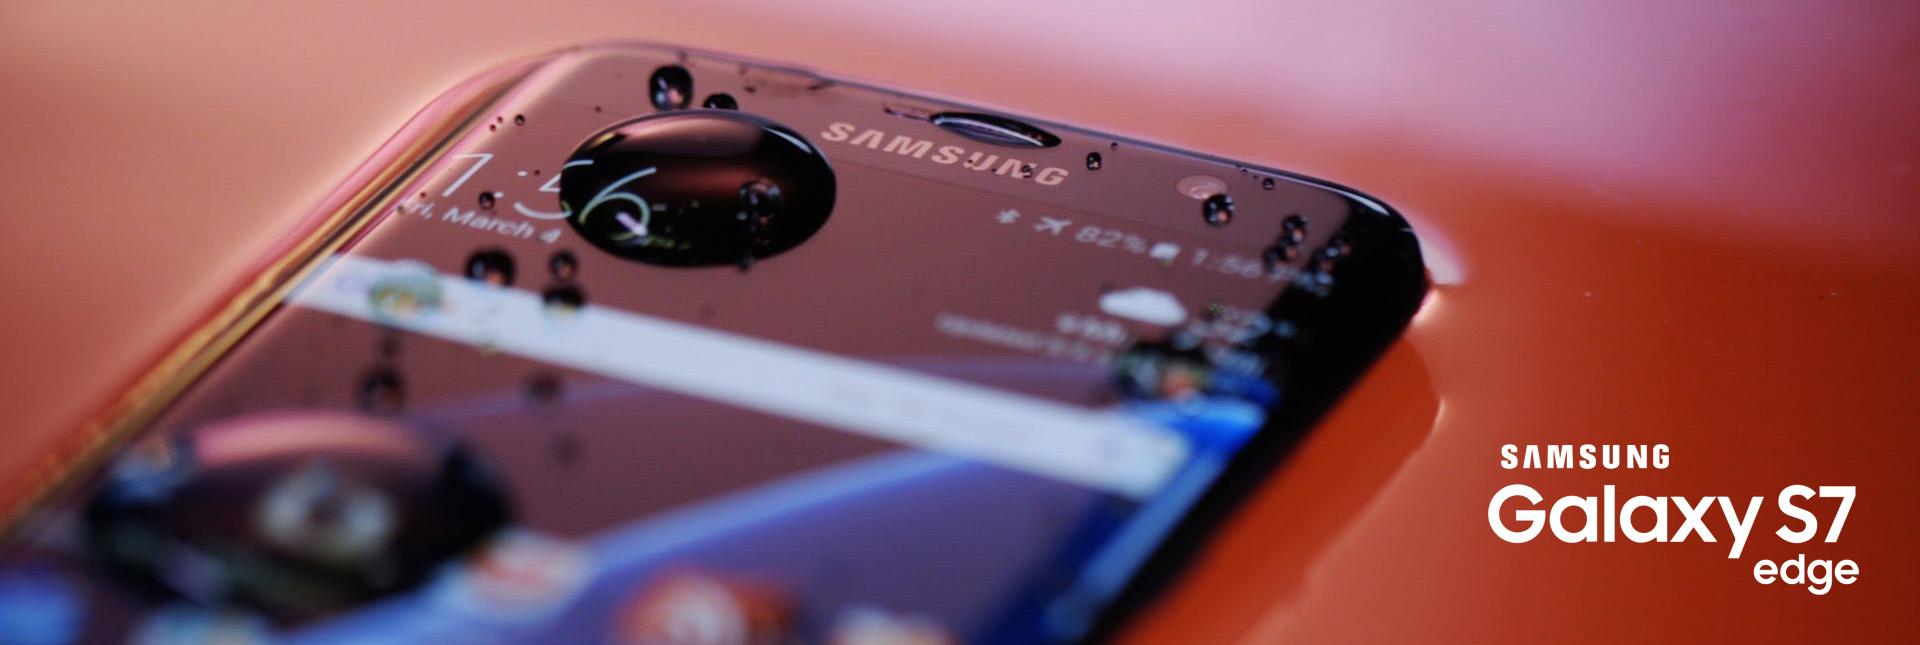 Samsung Galaxy S7 Edge water resistant IP68